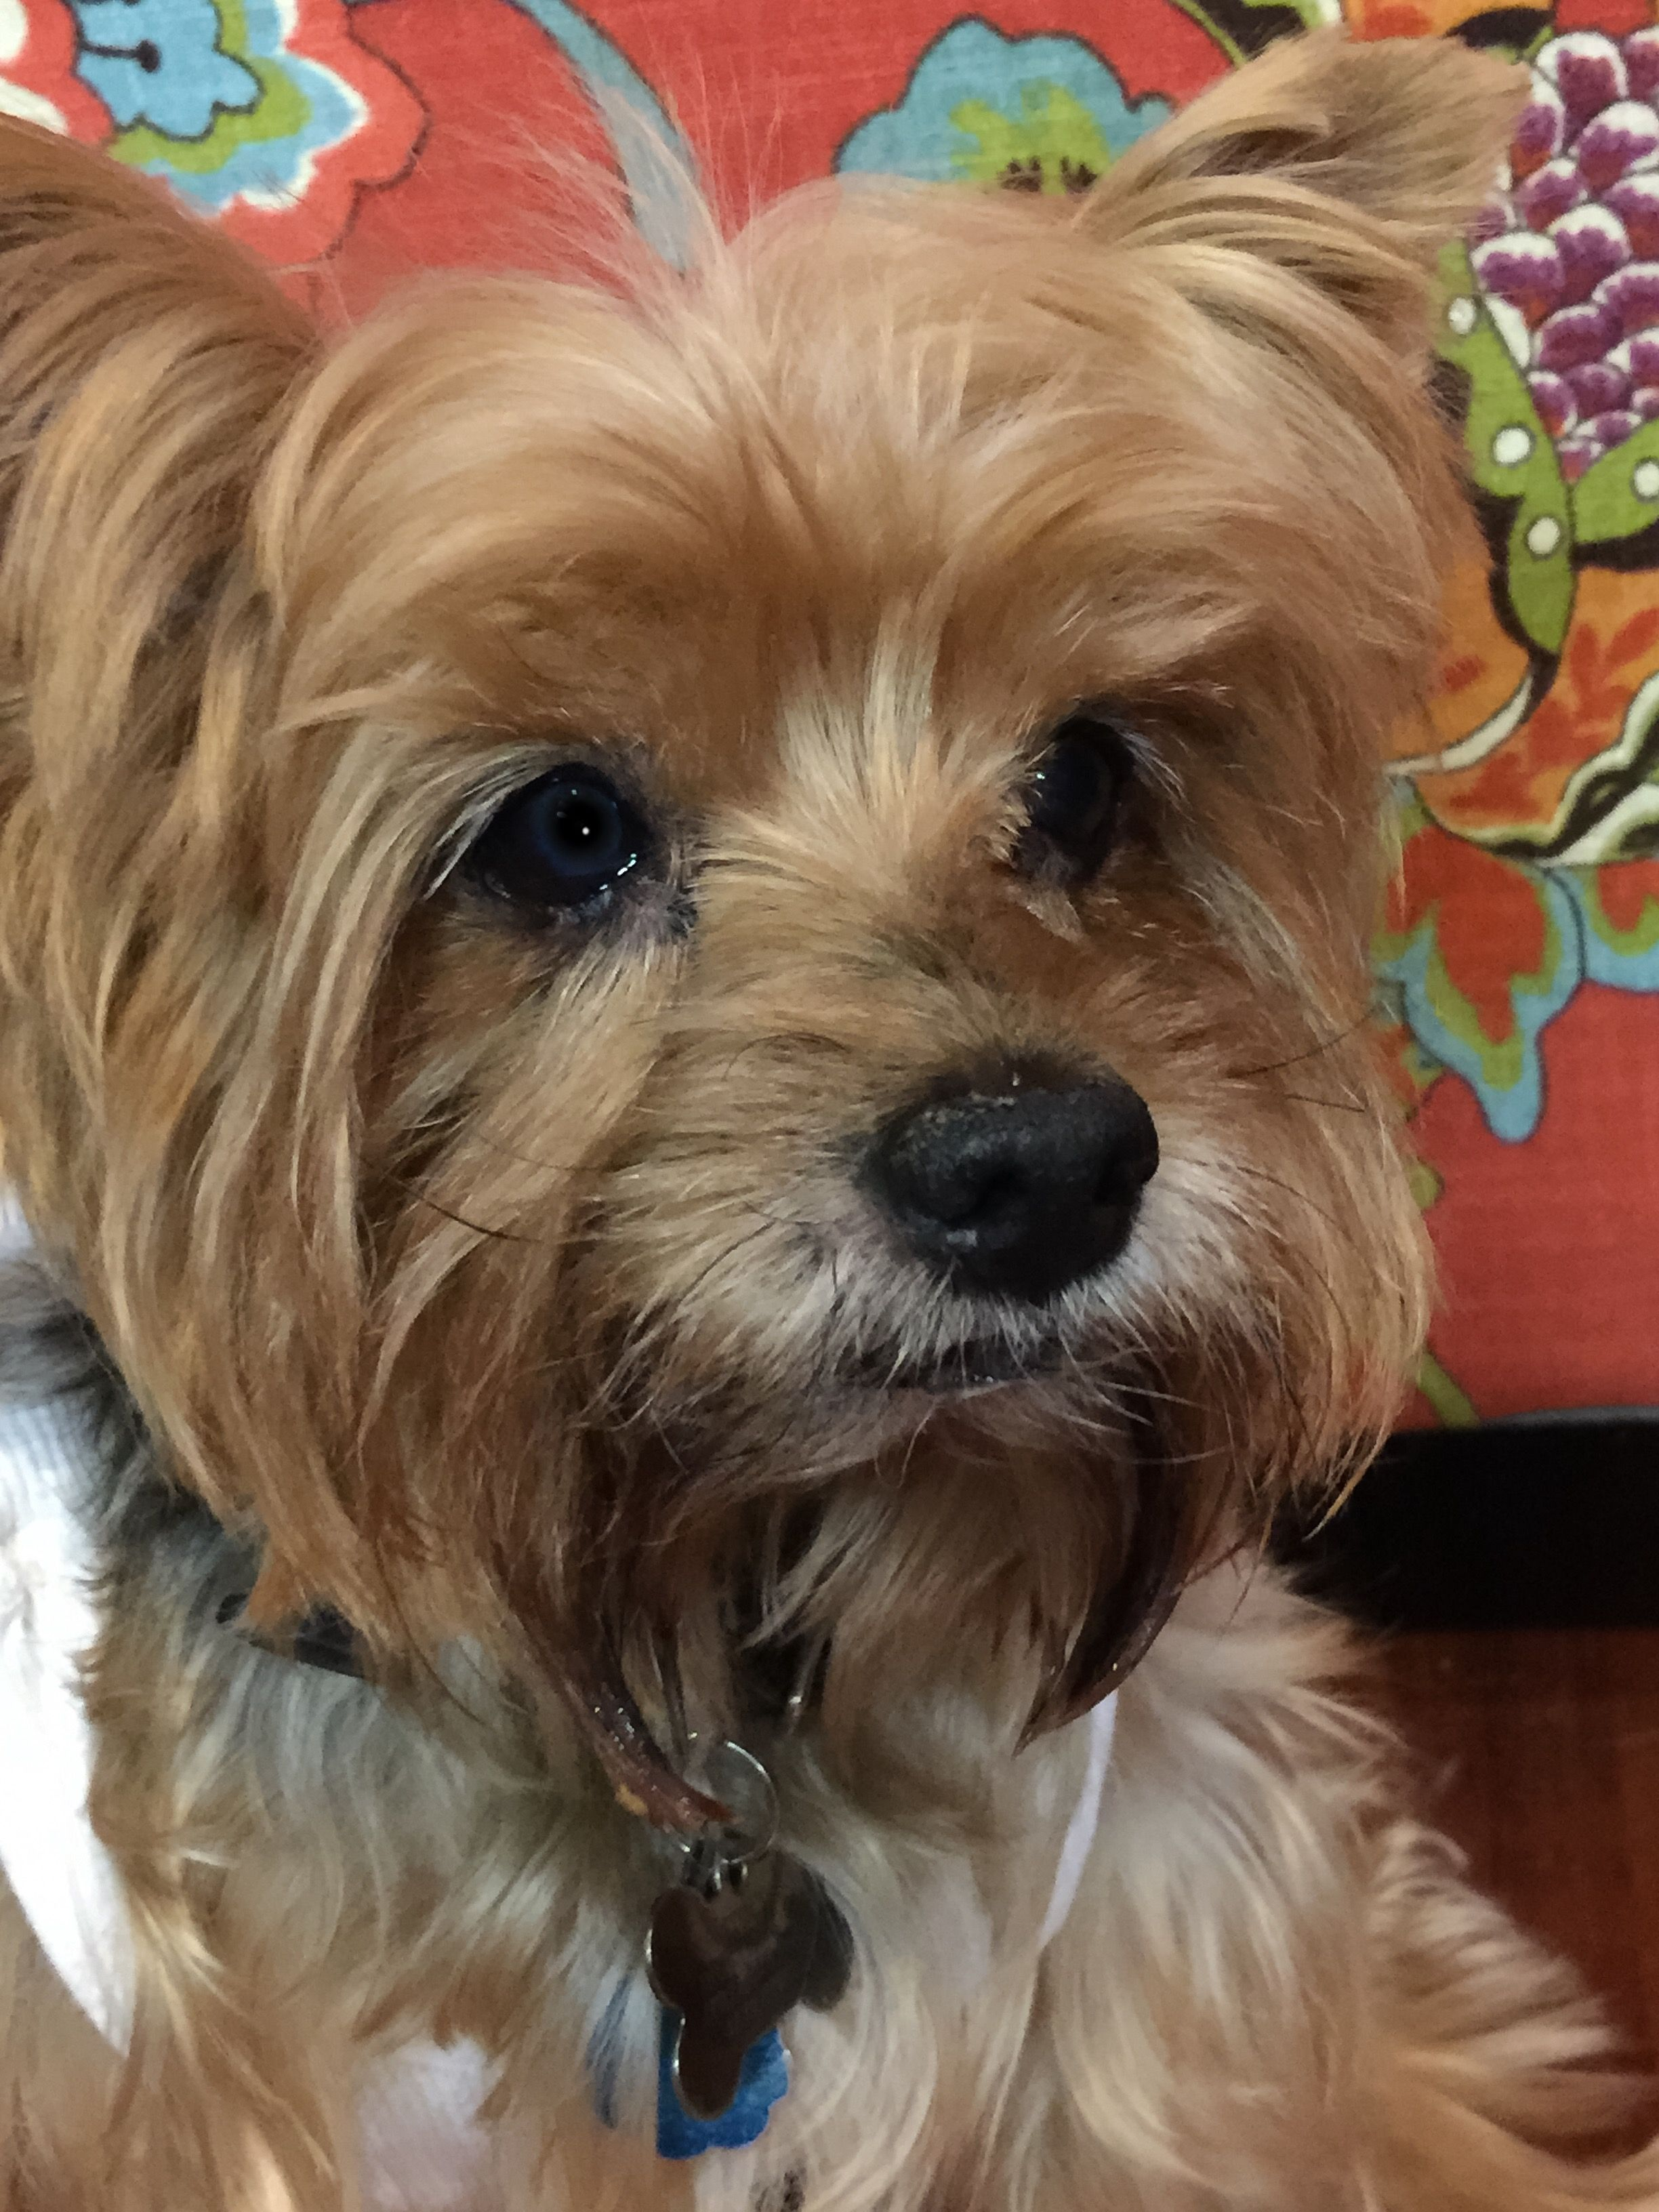 16 Yr Old Yorkie Grayhairrocks Yorkie Doggy Yorkshire Terrier